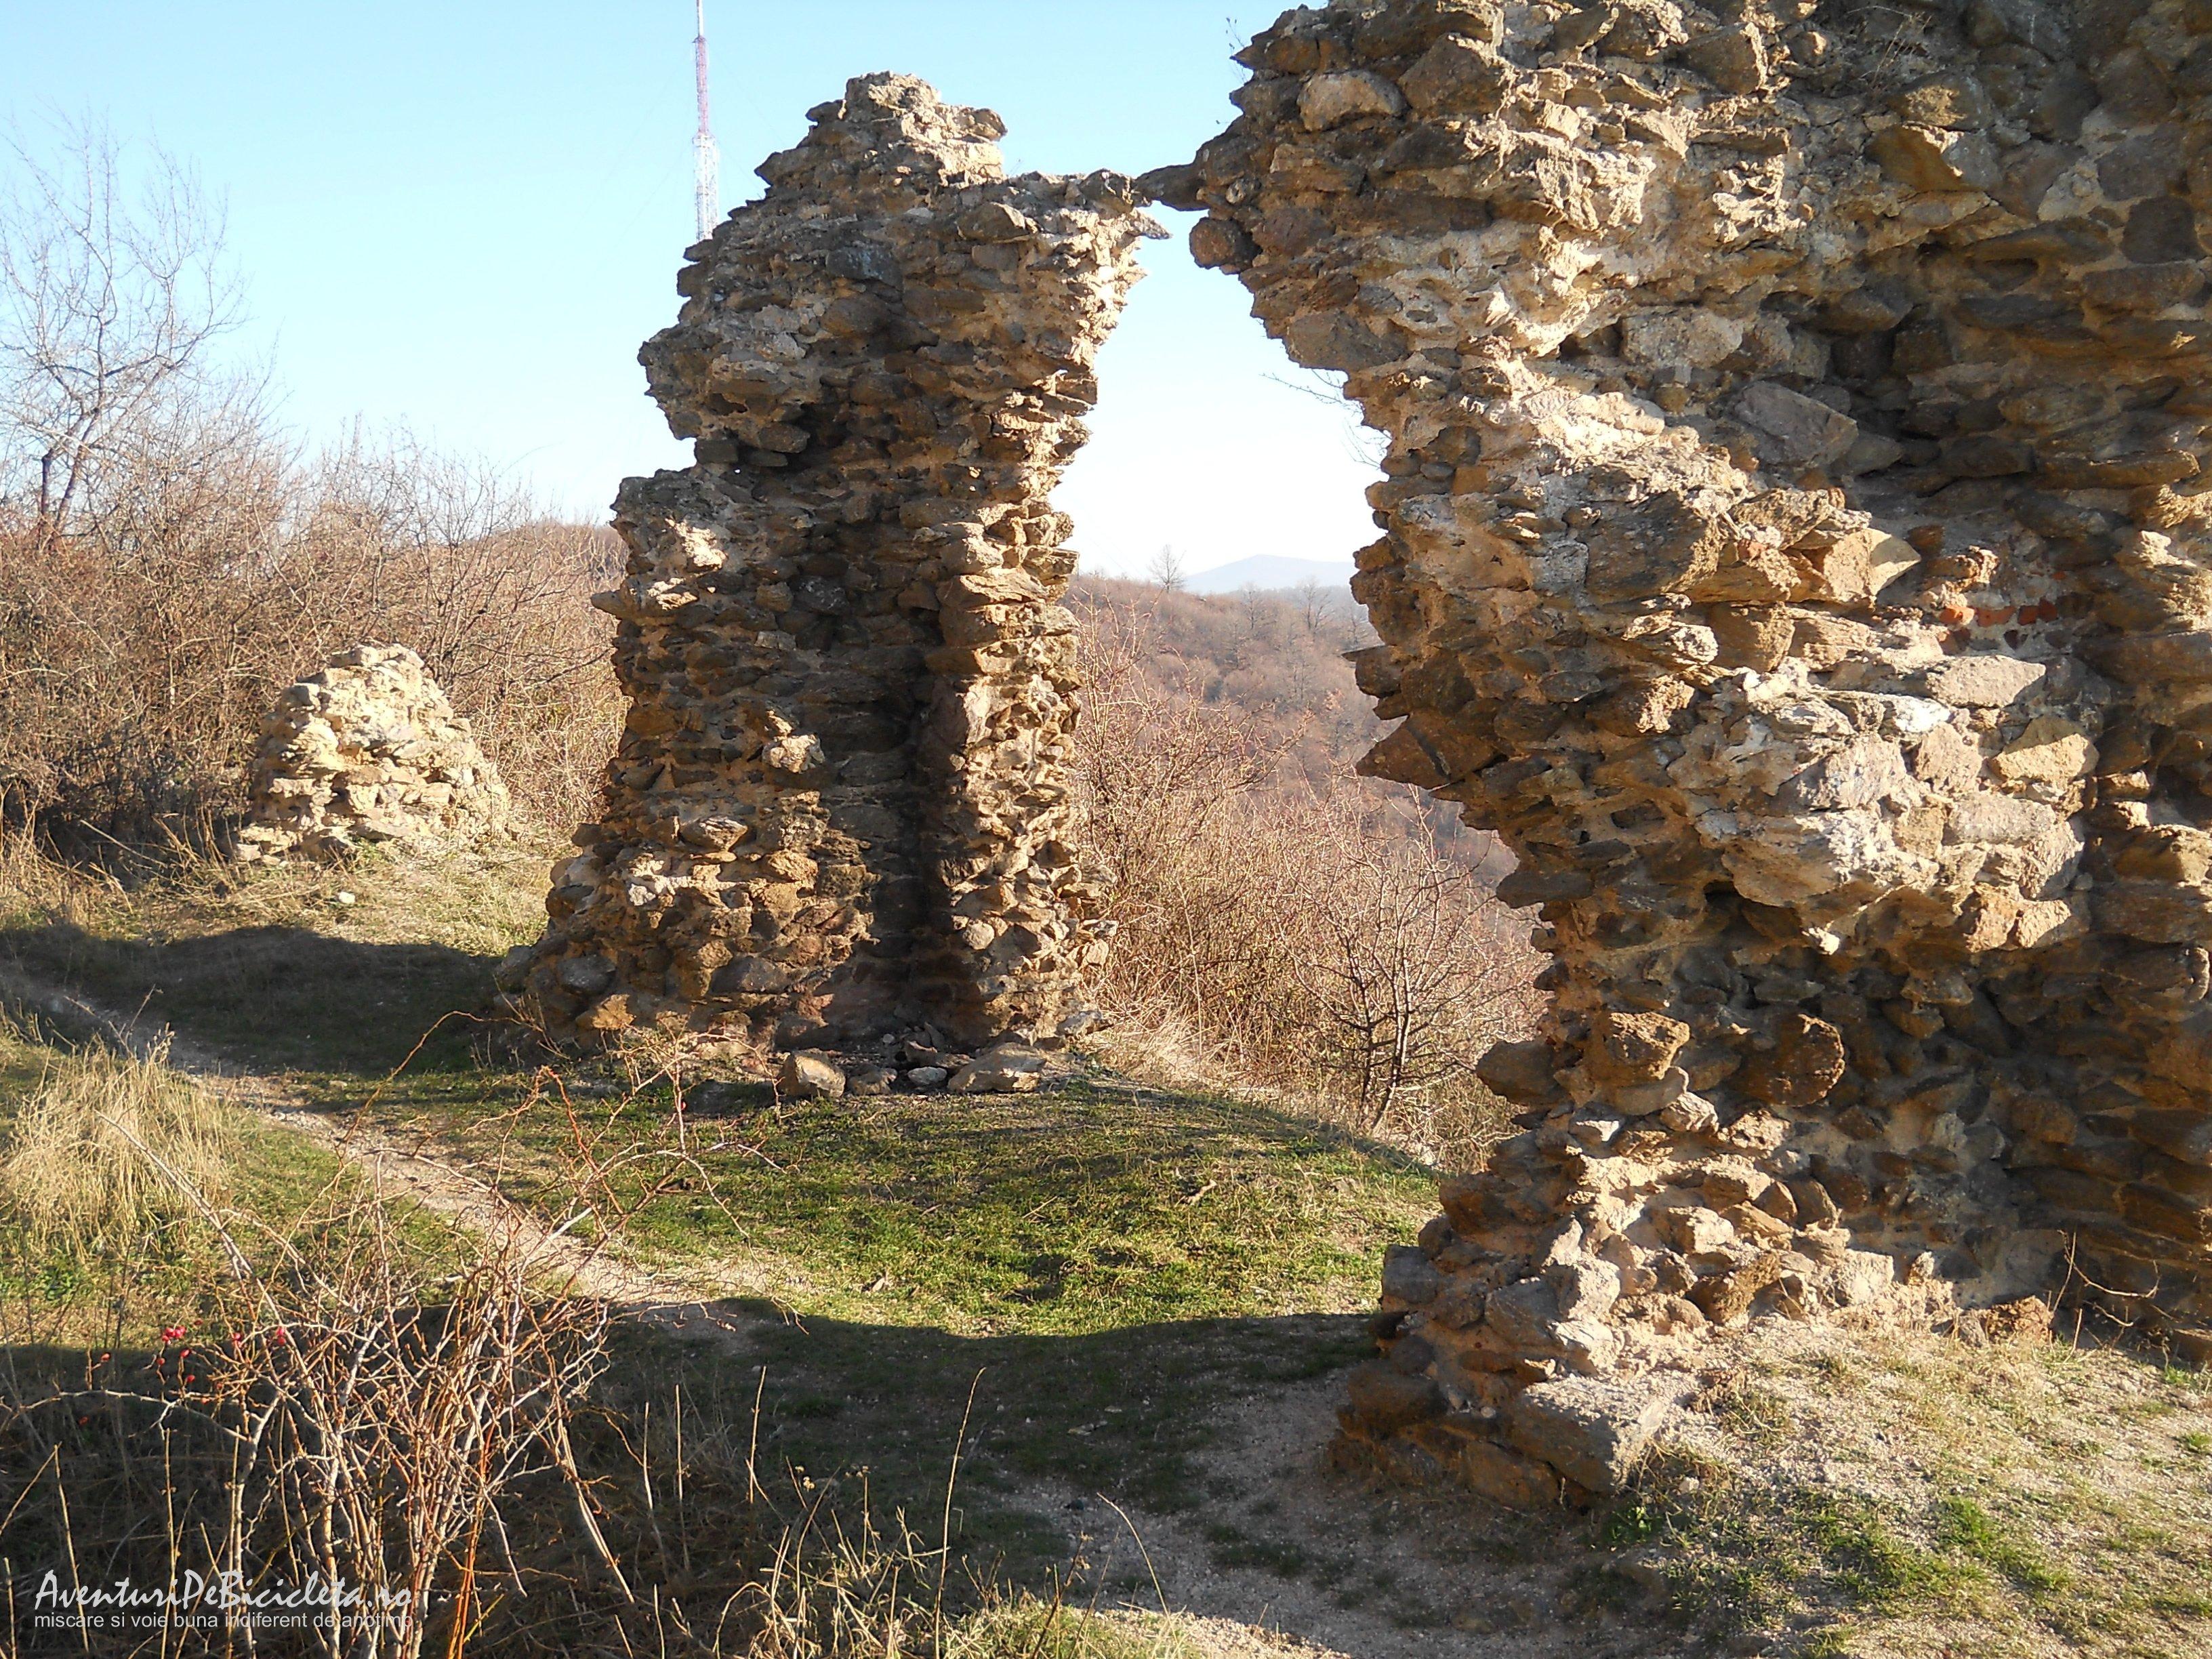 Ruinele cetatii din Siria